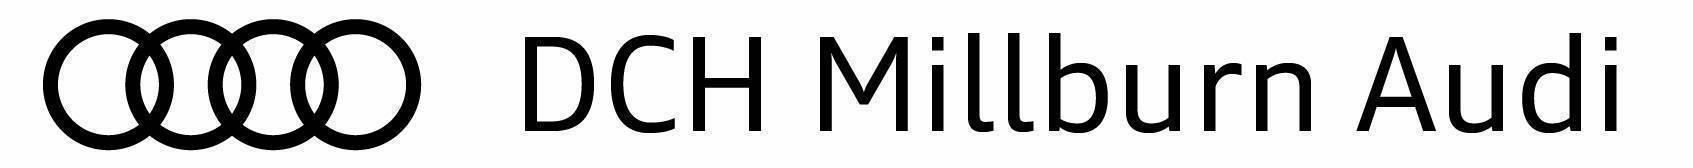 DCHMillburnAudi-logo-text-rings-01 black and white - large.jpg